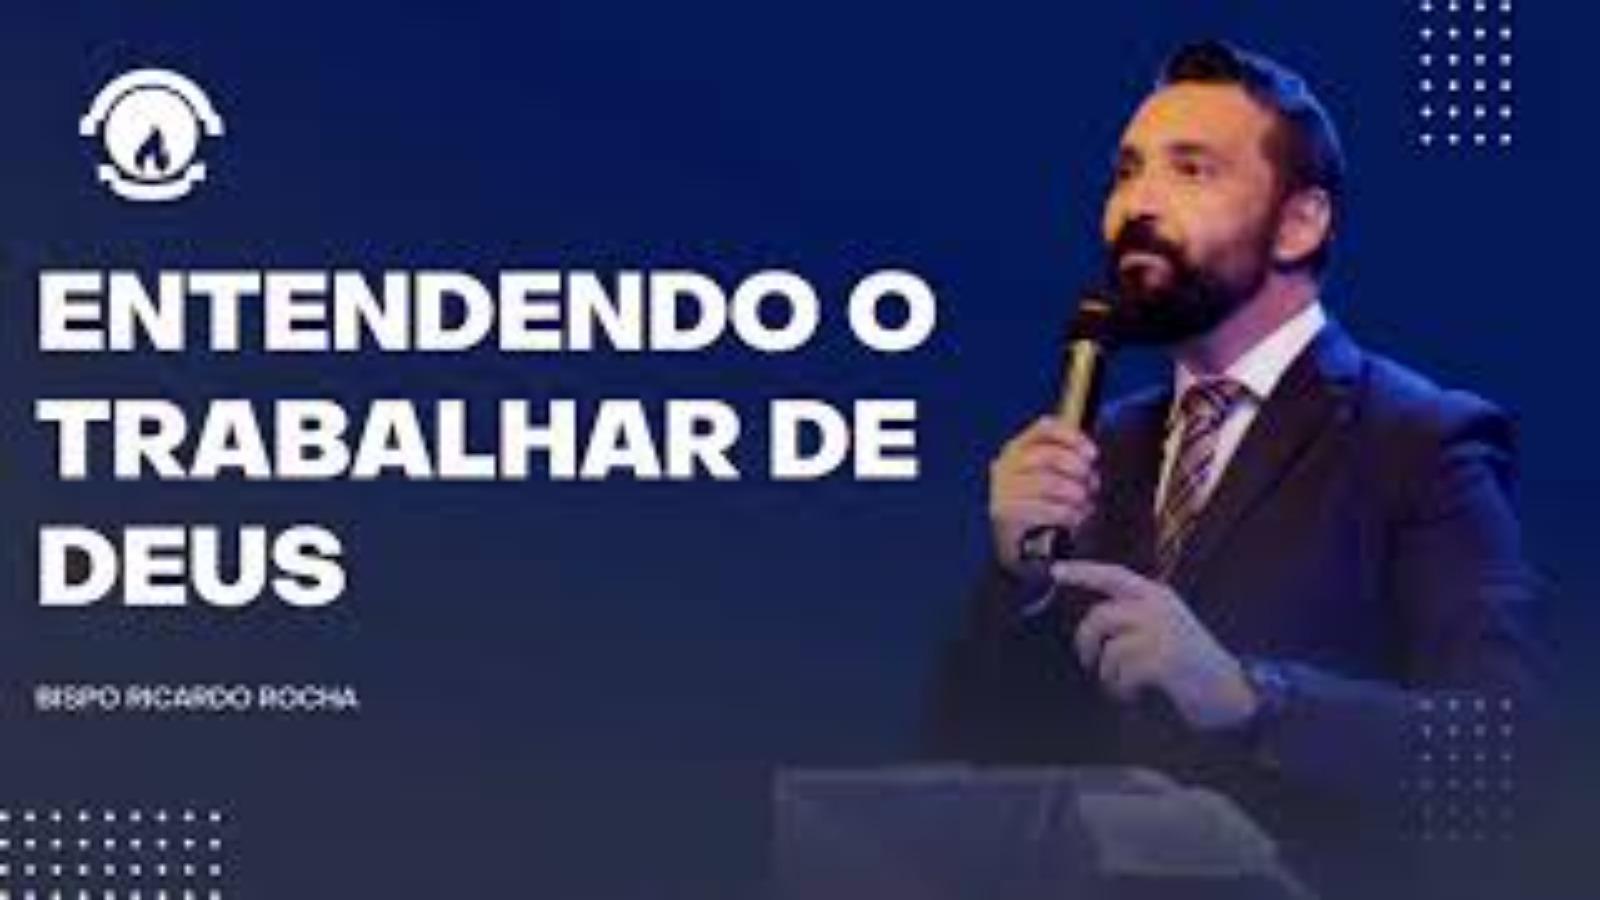 ENTENDENDO O TRABALHAR DE DEUS